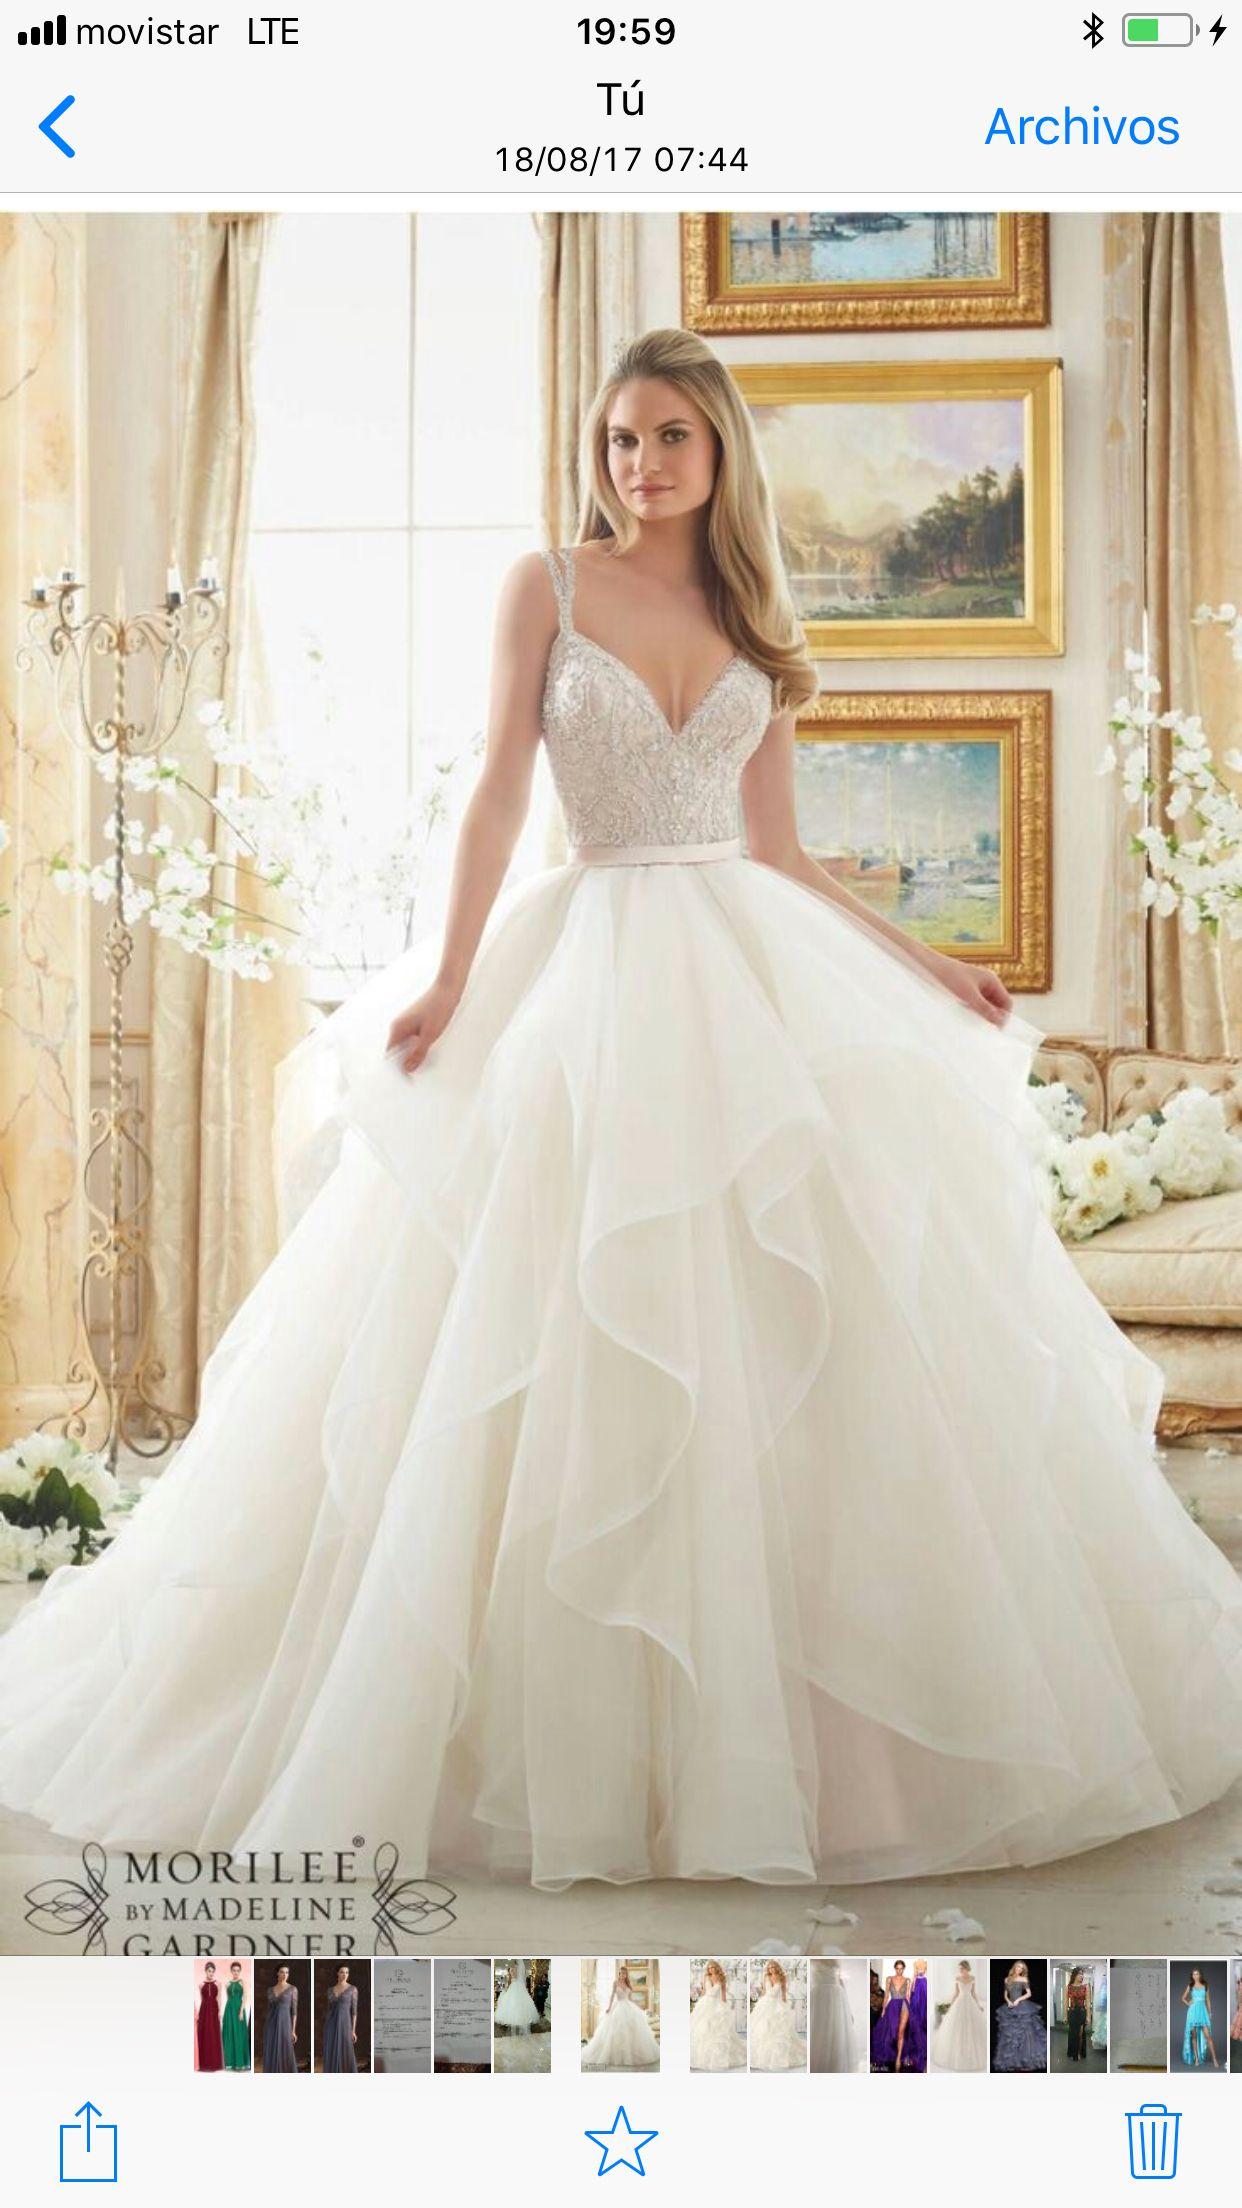 Best wedding dresses for 50 year olds  Pin by mariela calderon on Casa Valentina  Pinterest  Wedding